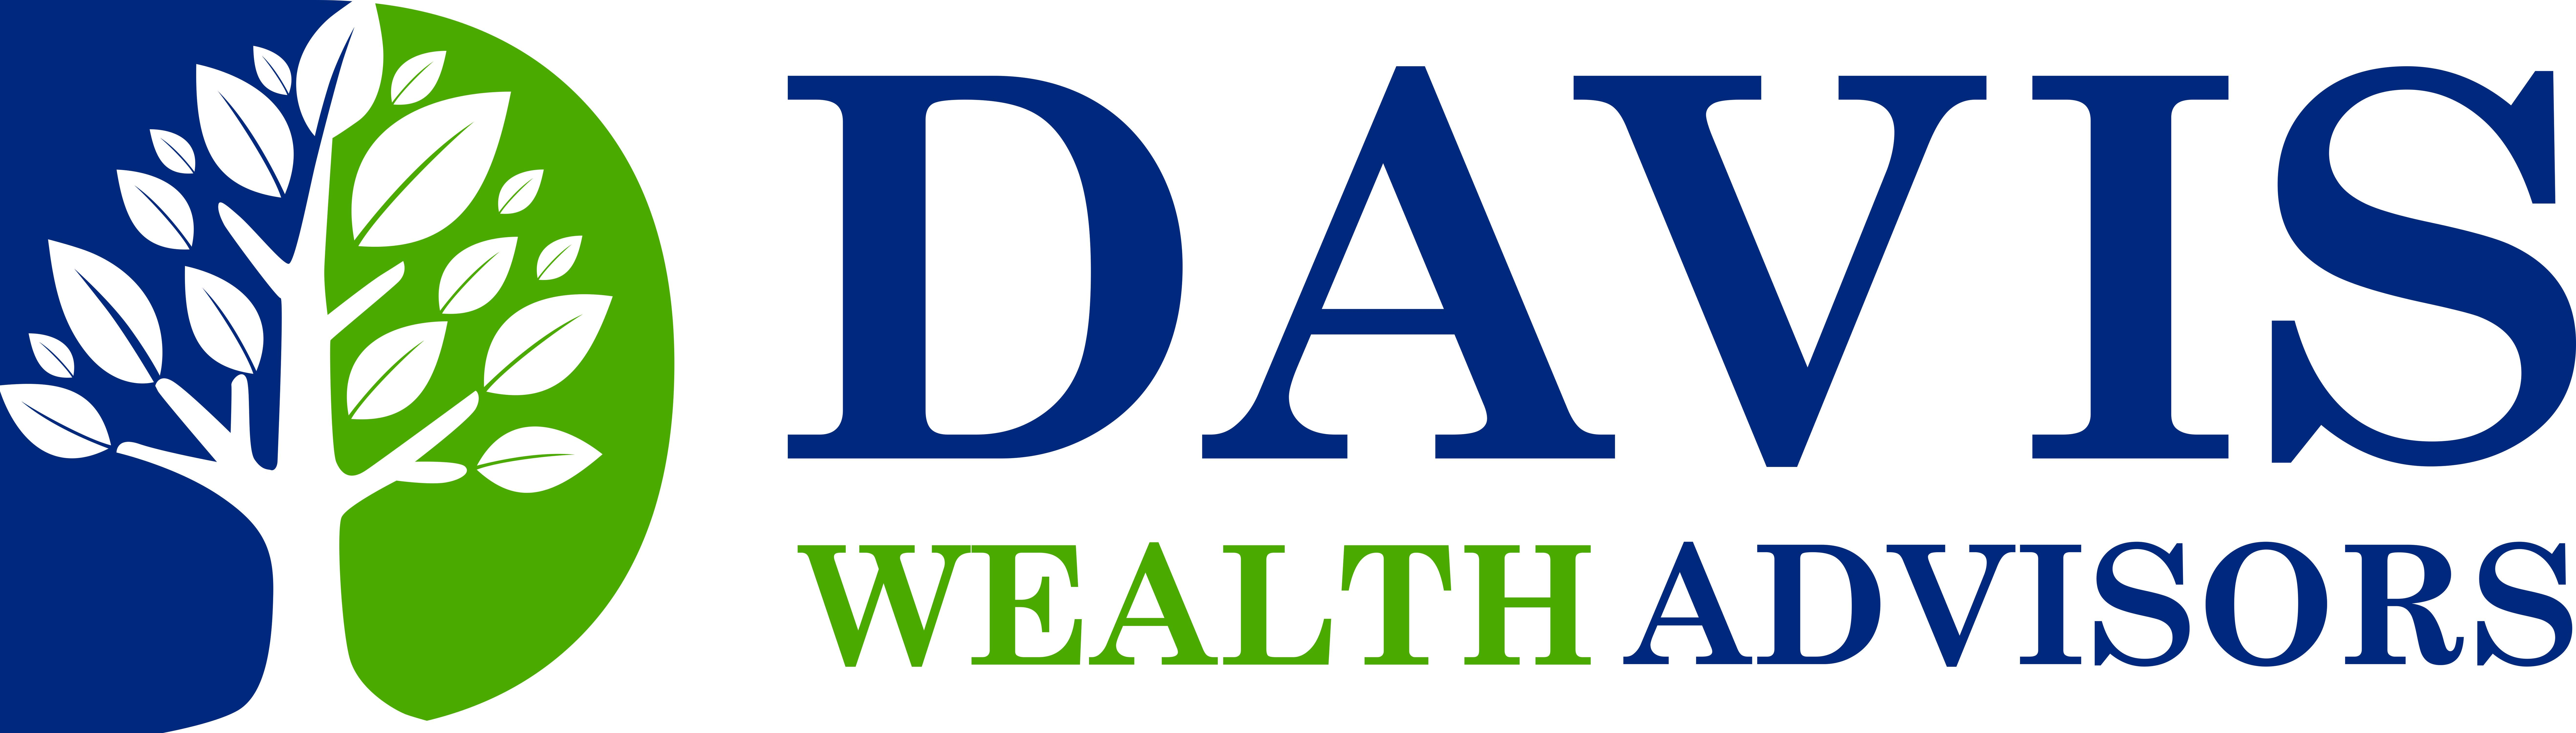 Davis Wealth Advisors